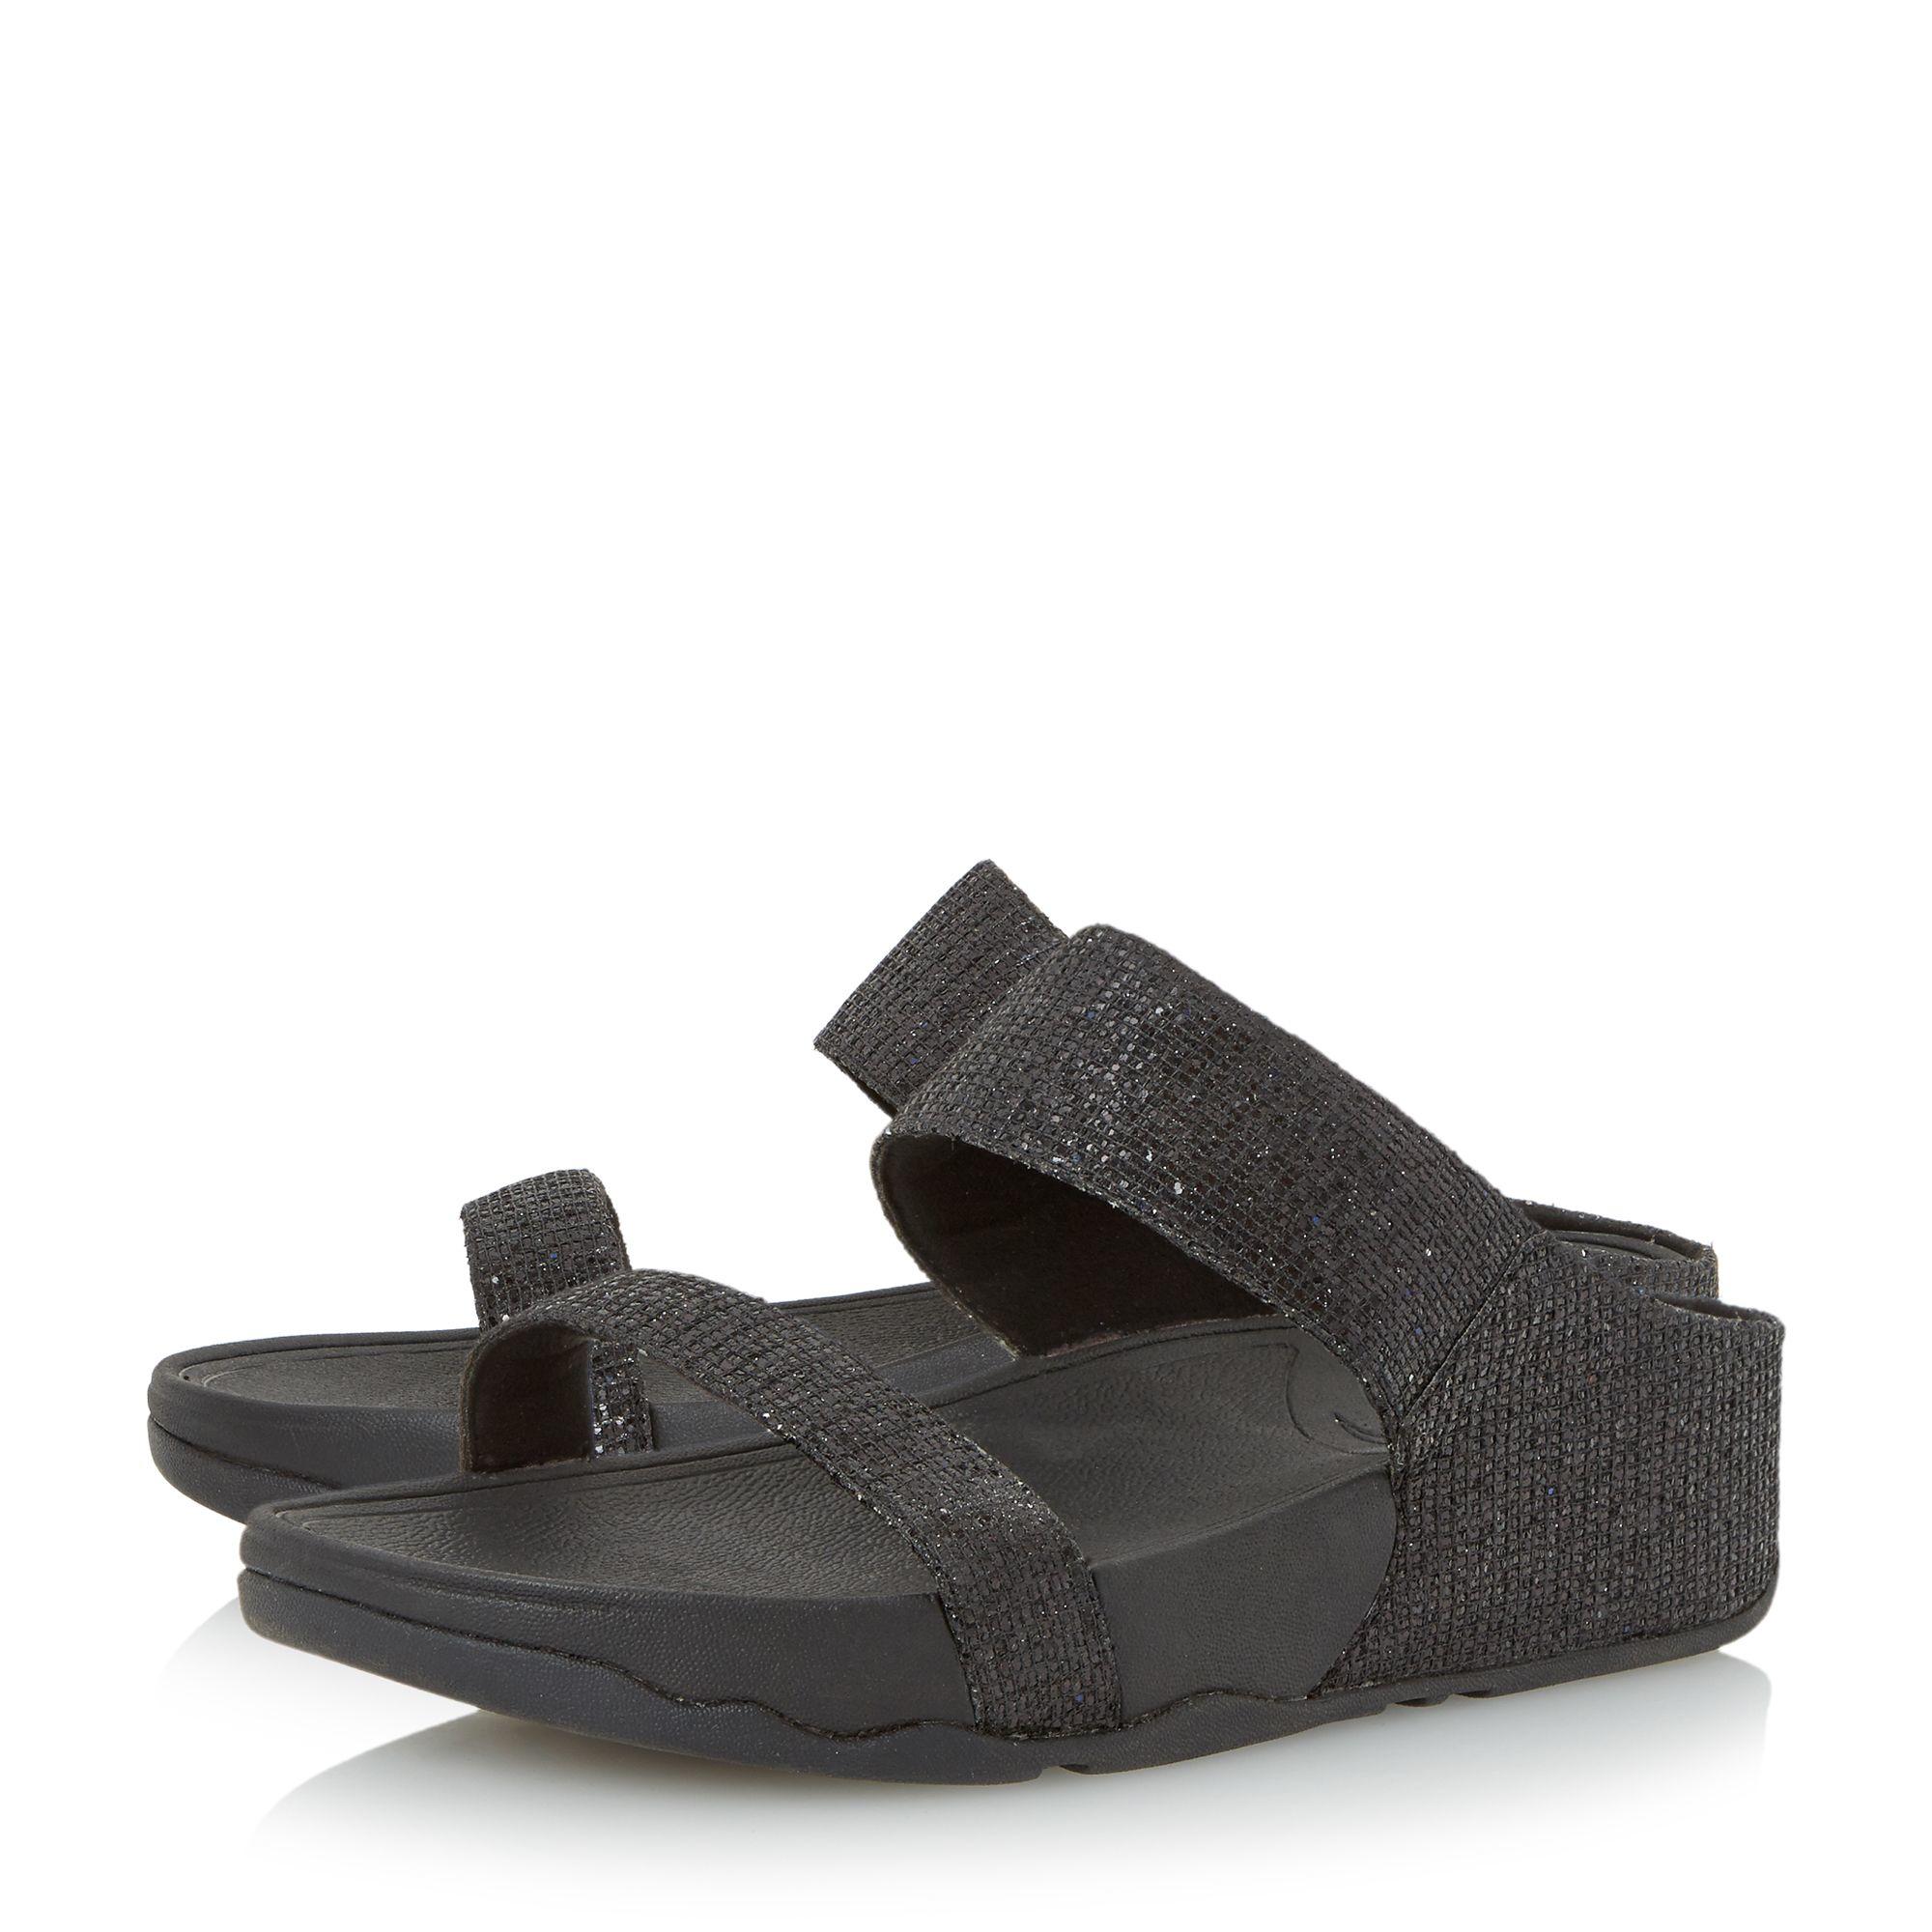 Fitflop Lulu Superglitz Wedge Sandals In Black Lyst